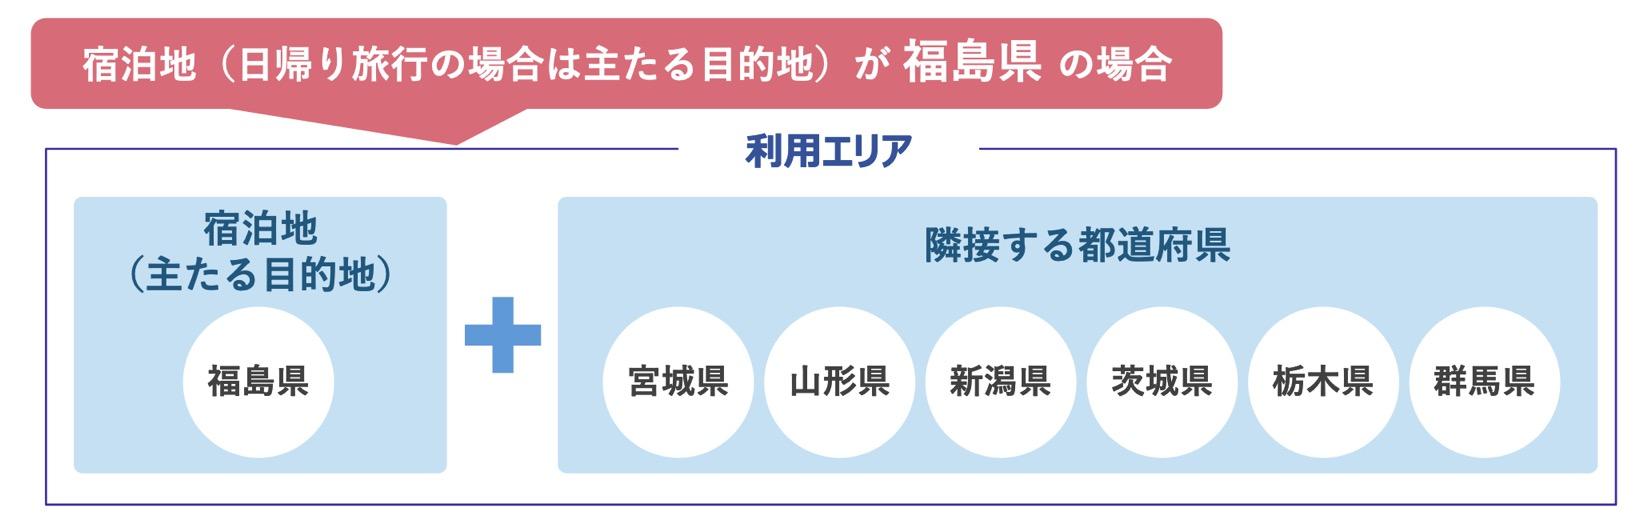 GoToトラベル「地域共通クーポン」:隣接県